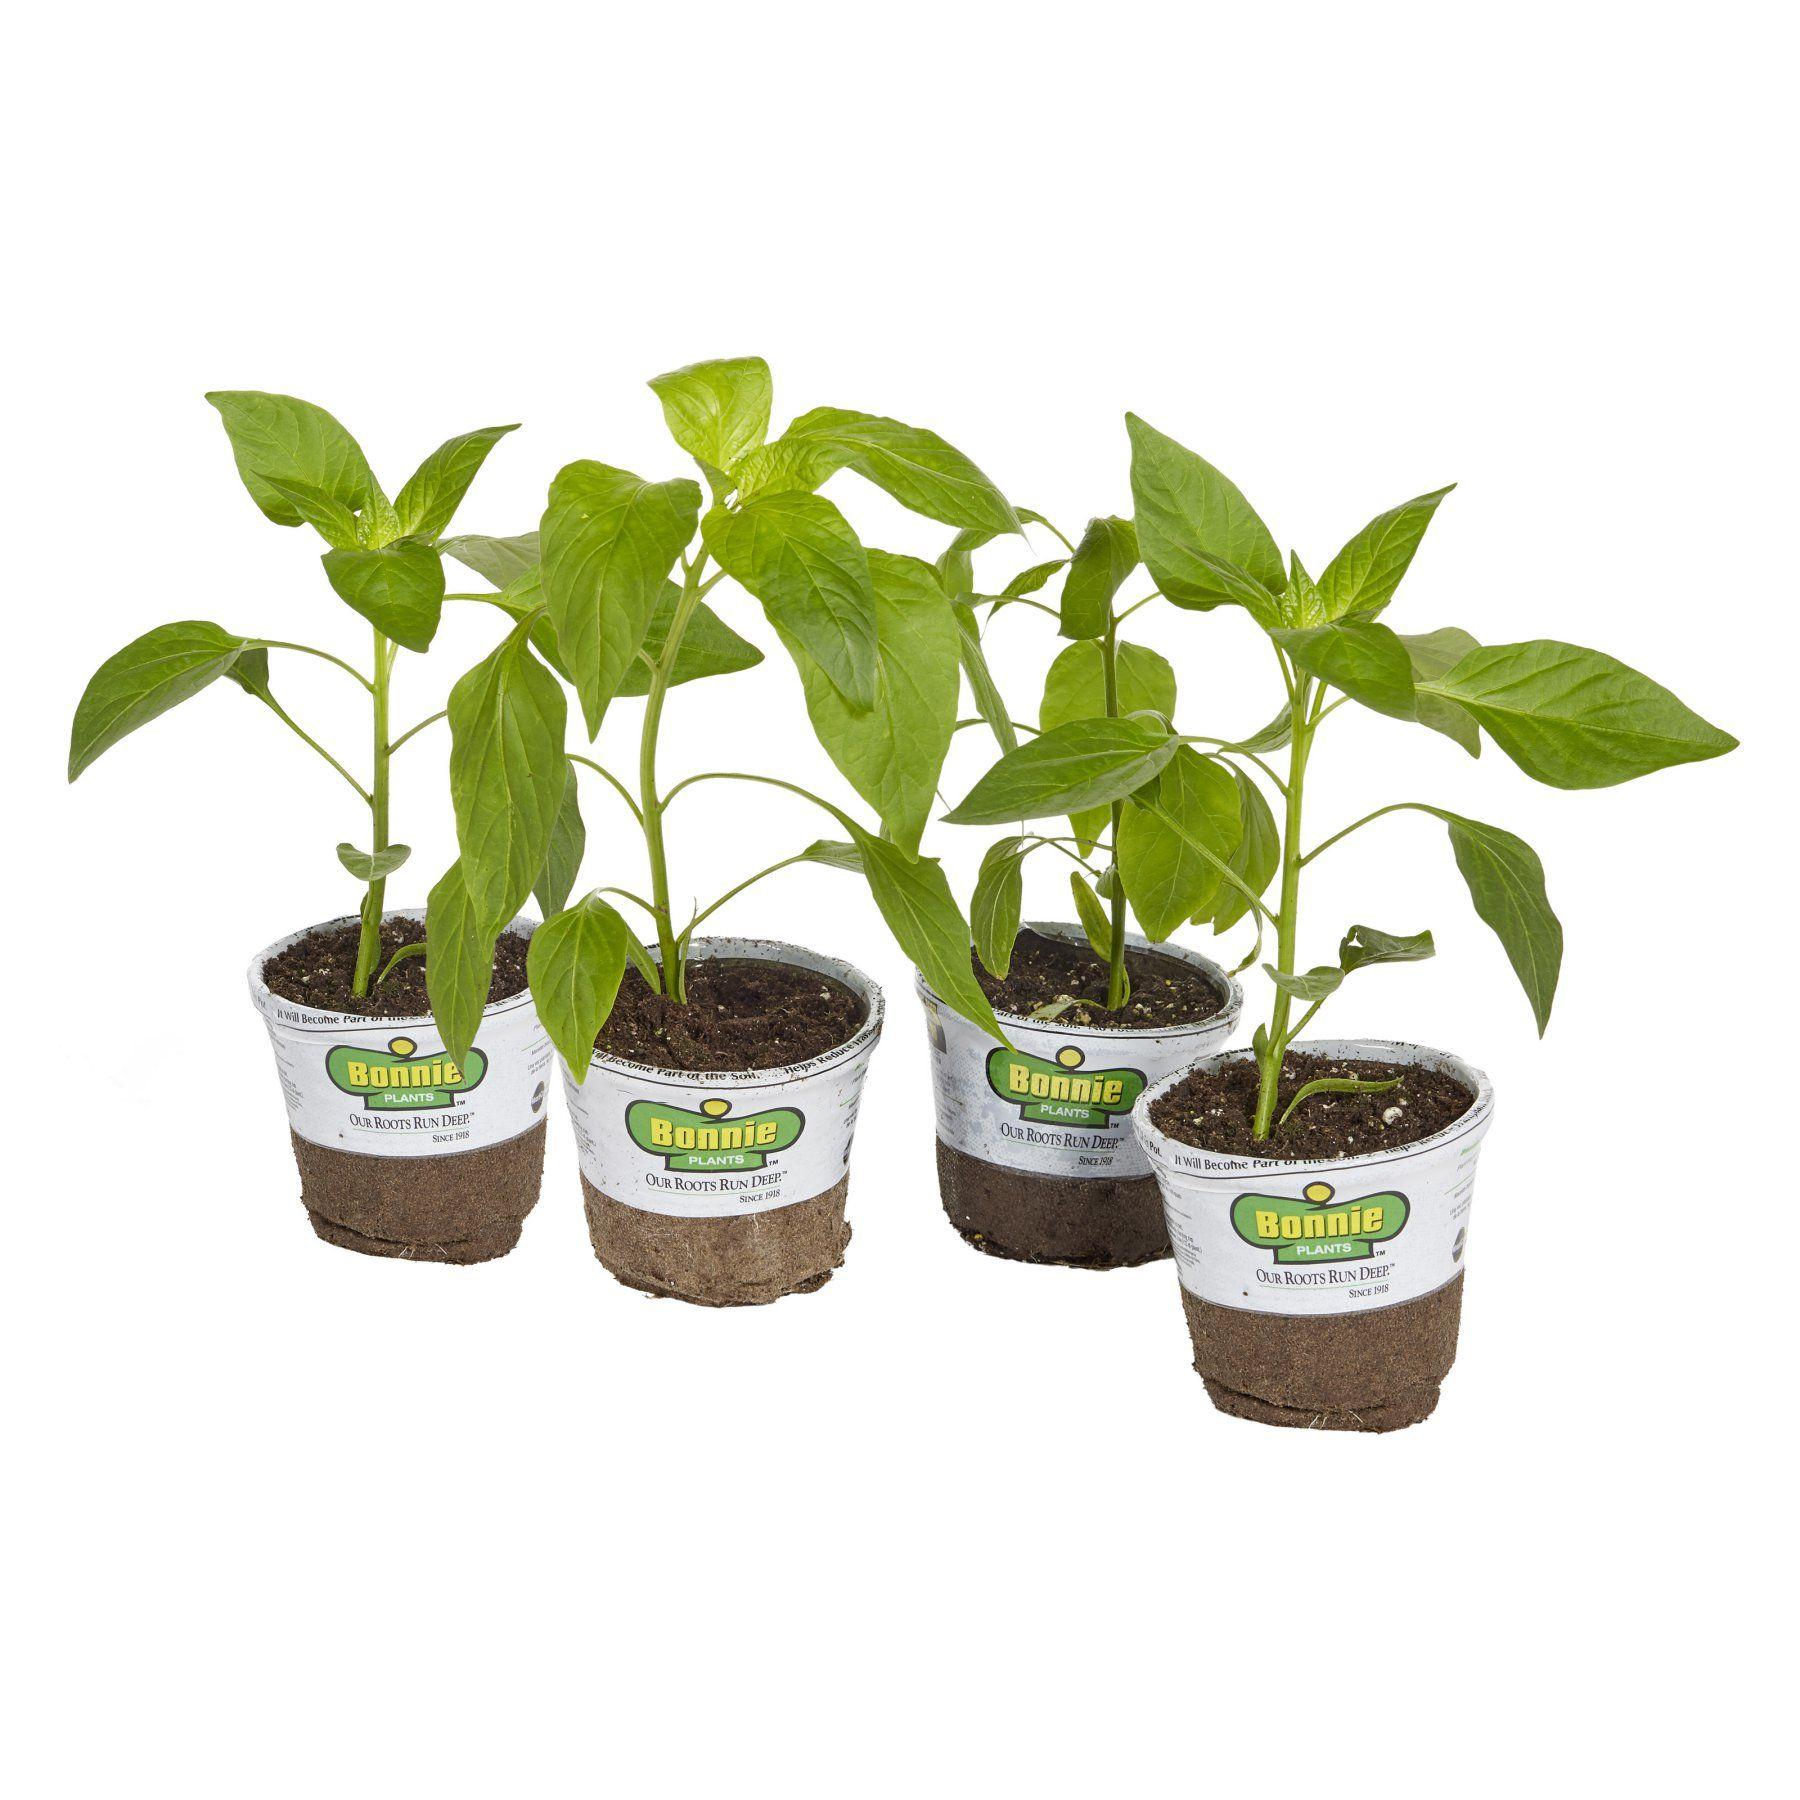 Bonnie Plants Sweet N Heat Pepper Kit Set Of 4